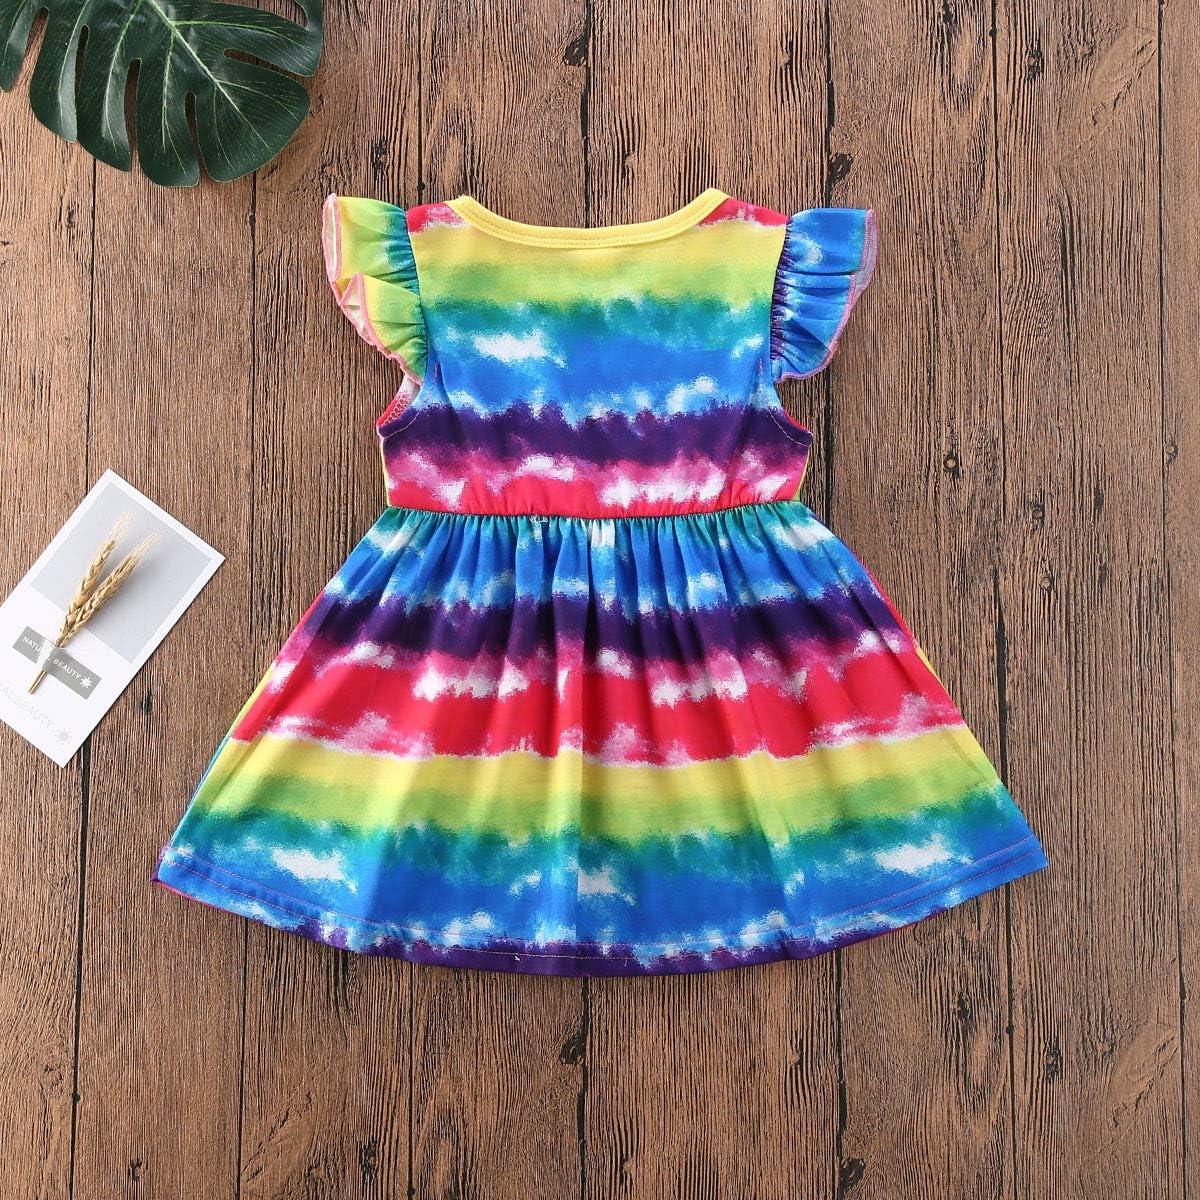 Rainbow TIE DYE Dress Rainbow PinWheel Tye Dye Baby Girl/'s Ruffle Dress Infant sizes 3 6 12 18 24 months Grateful Dead Love